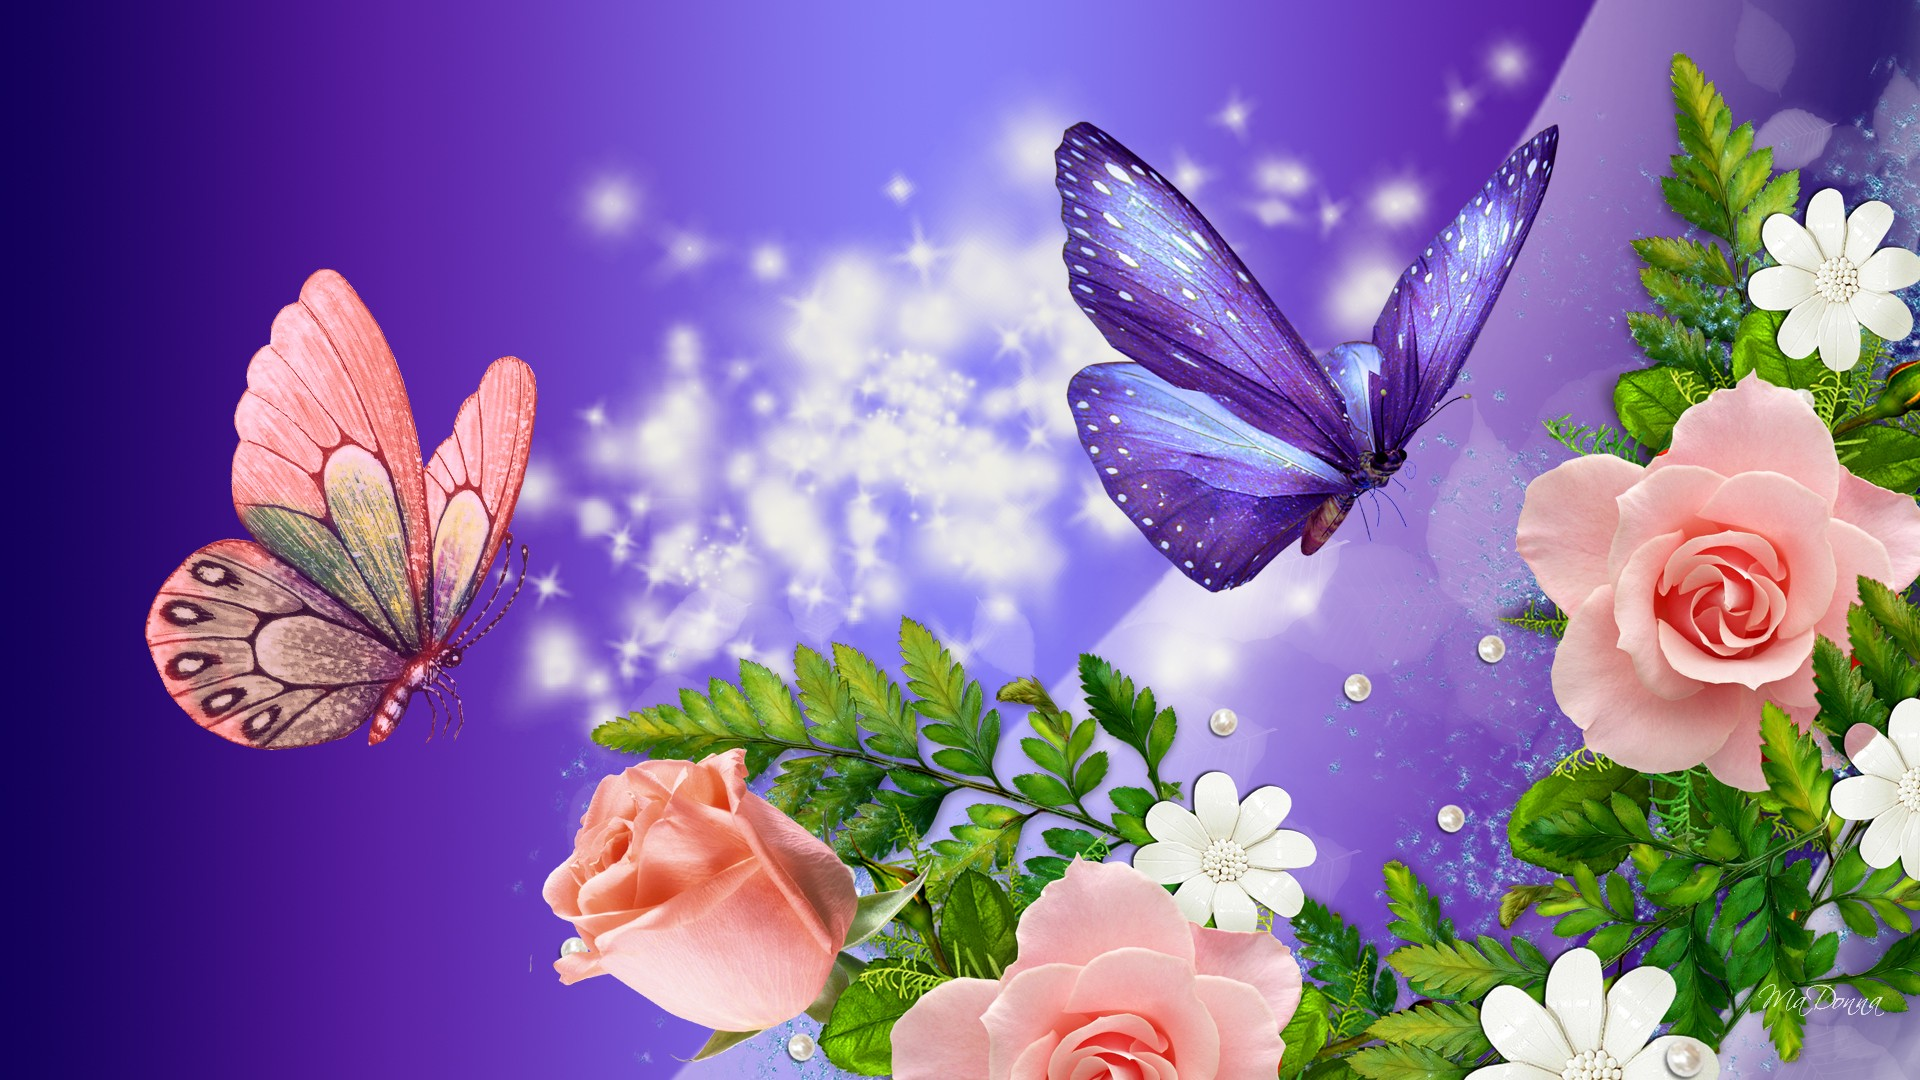 Best Flower Wallpapers For Desktop 1920x1080